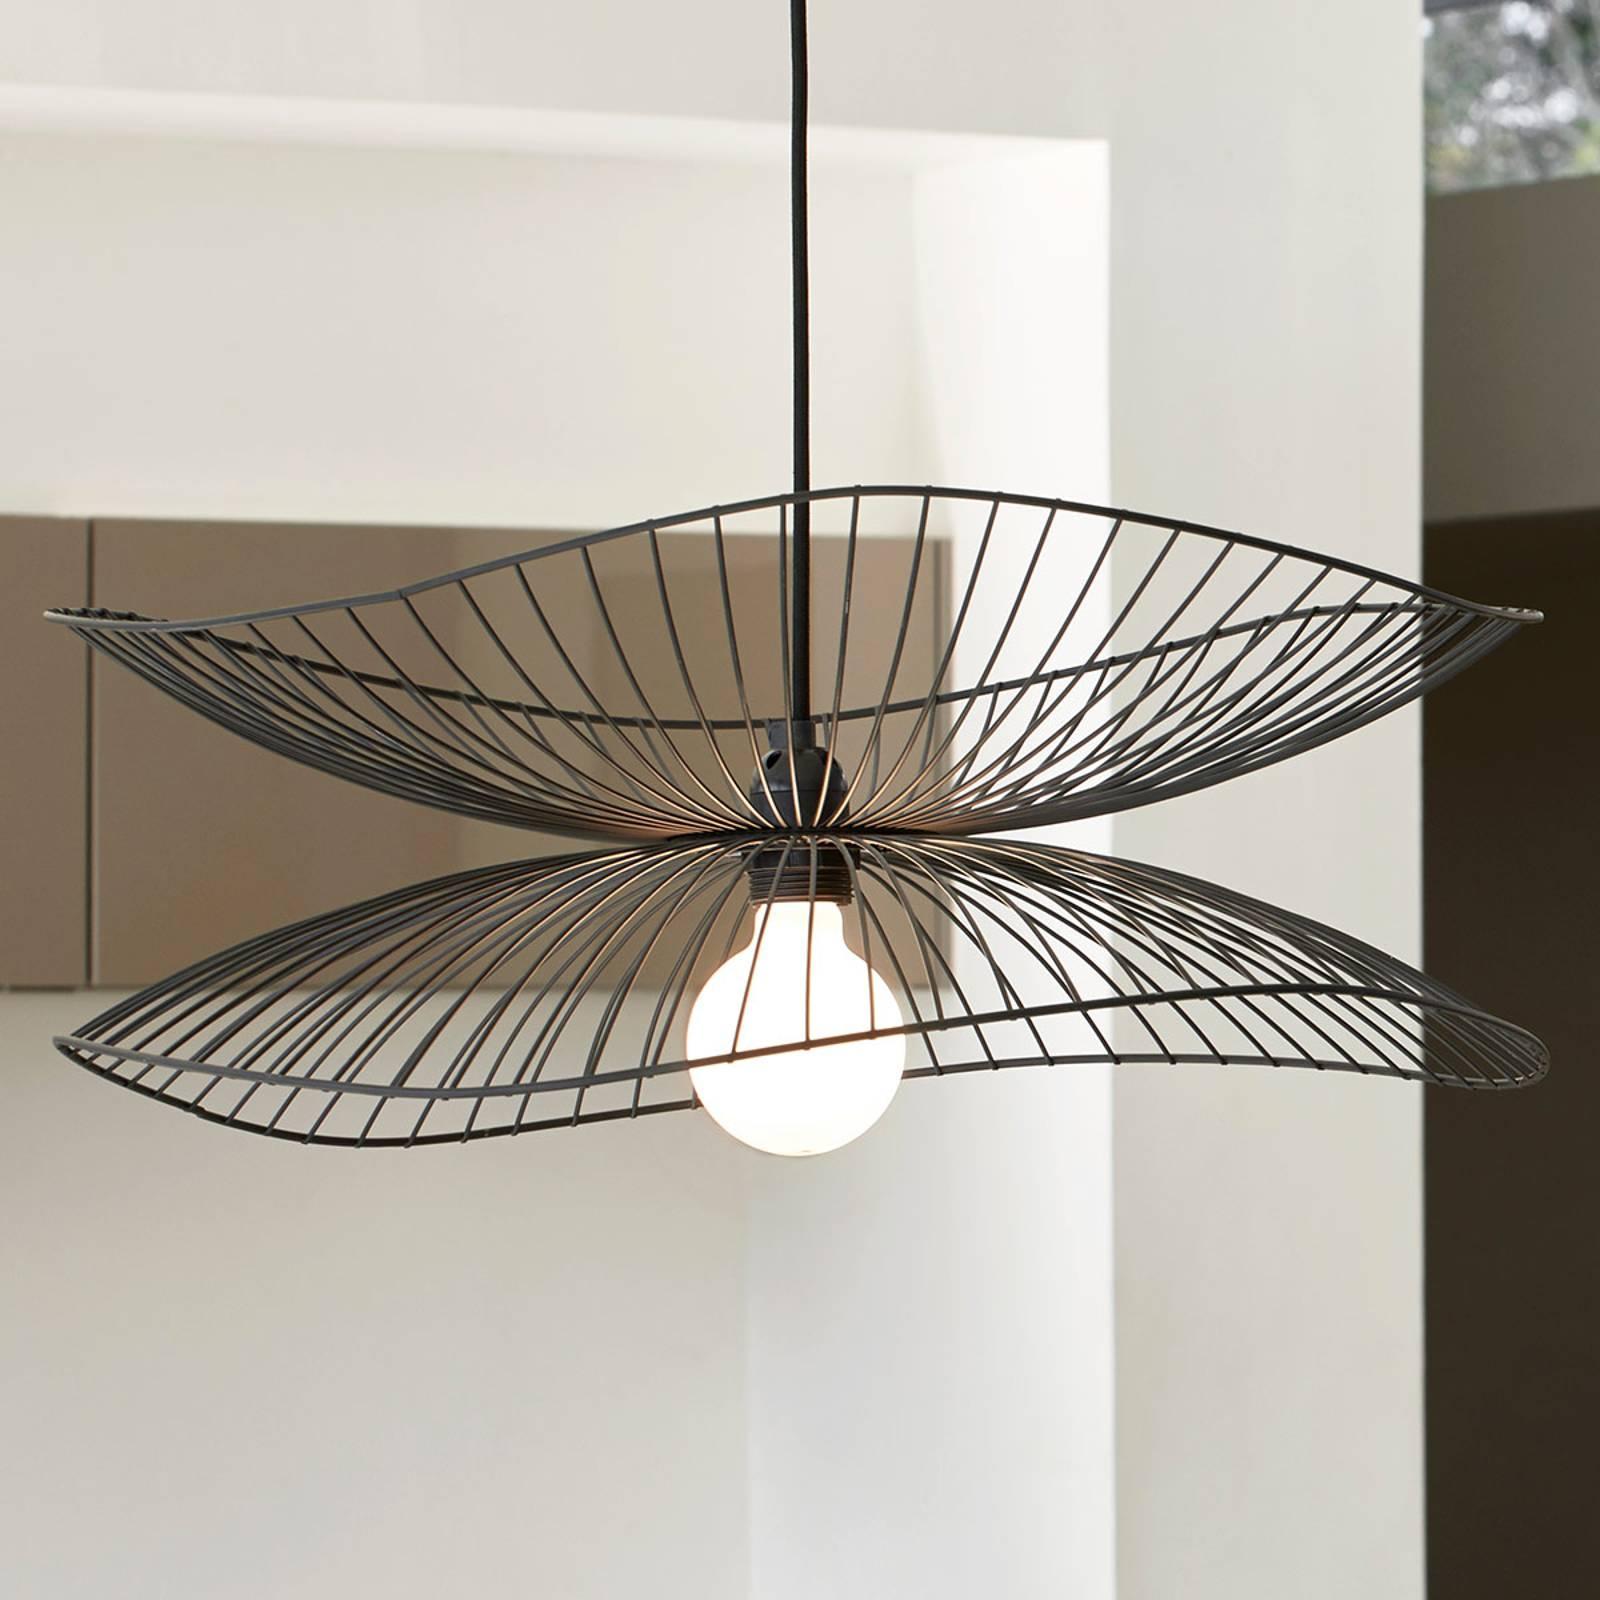 Forestier Libellule S hanglamp, 56 cm, zwart